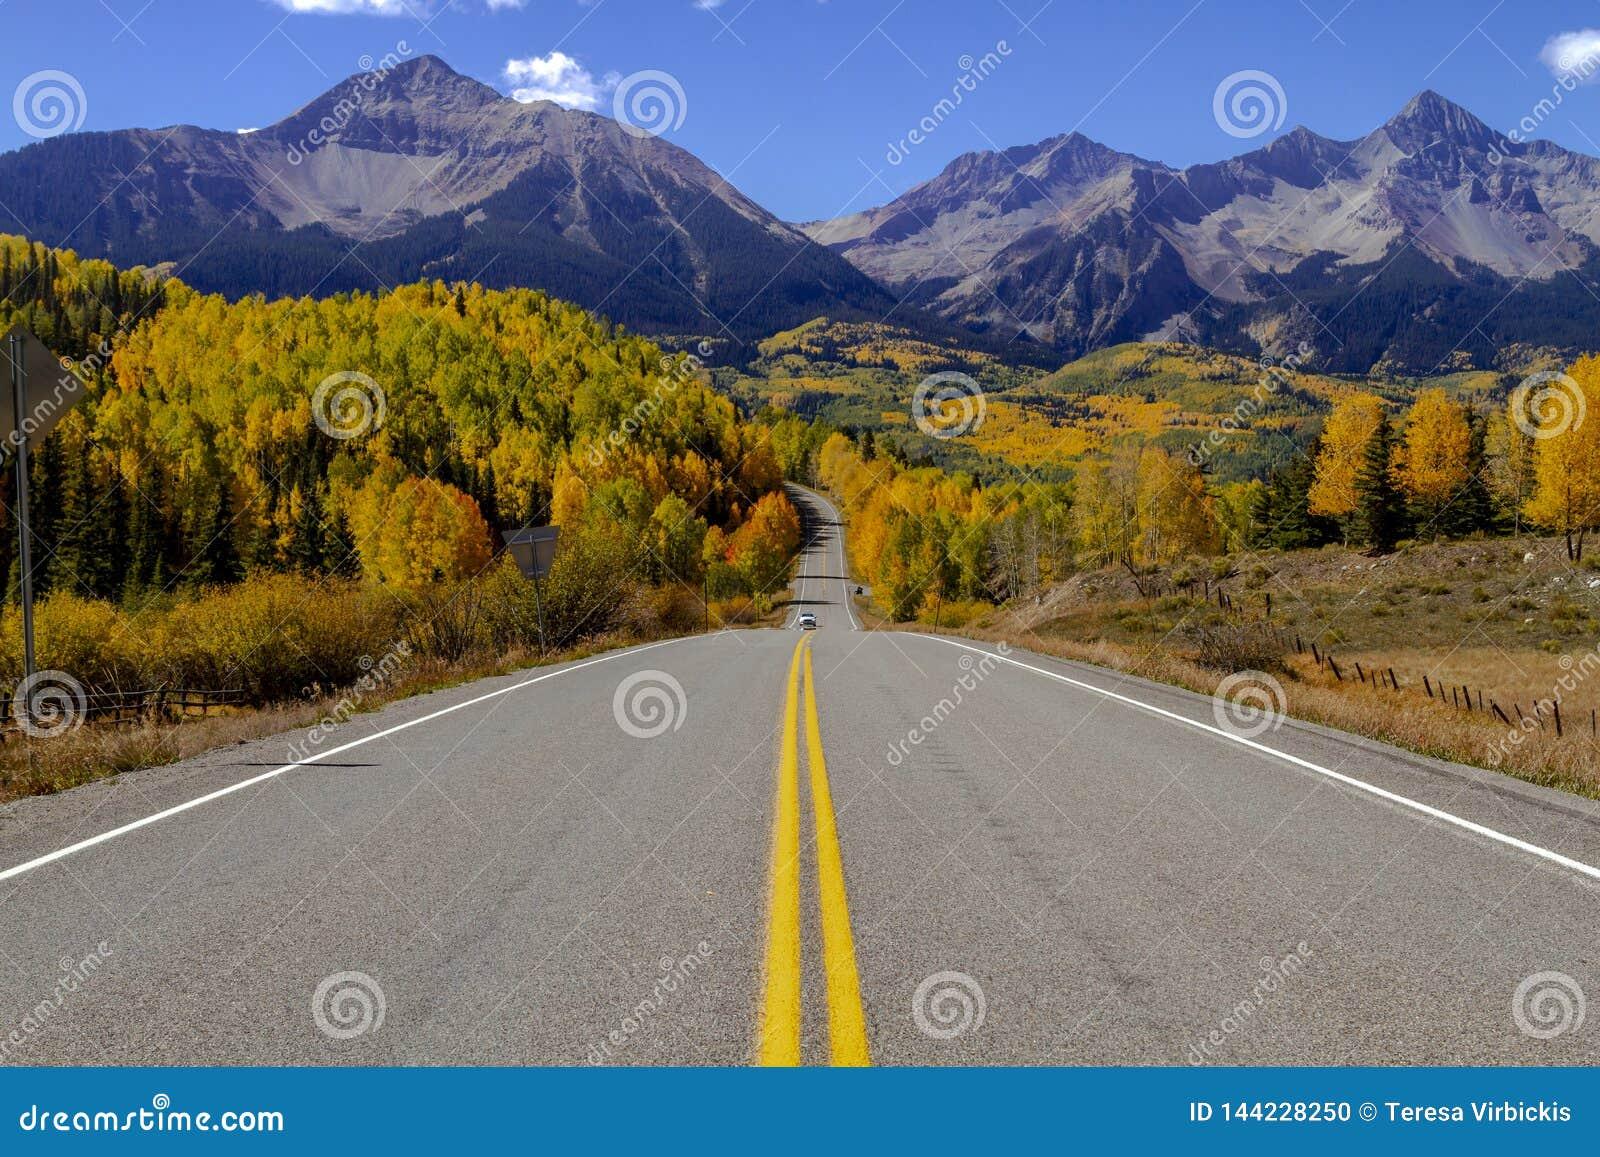 Autumn Color in San Juan und Rocky Mountains von Colorado